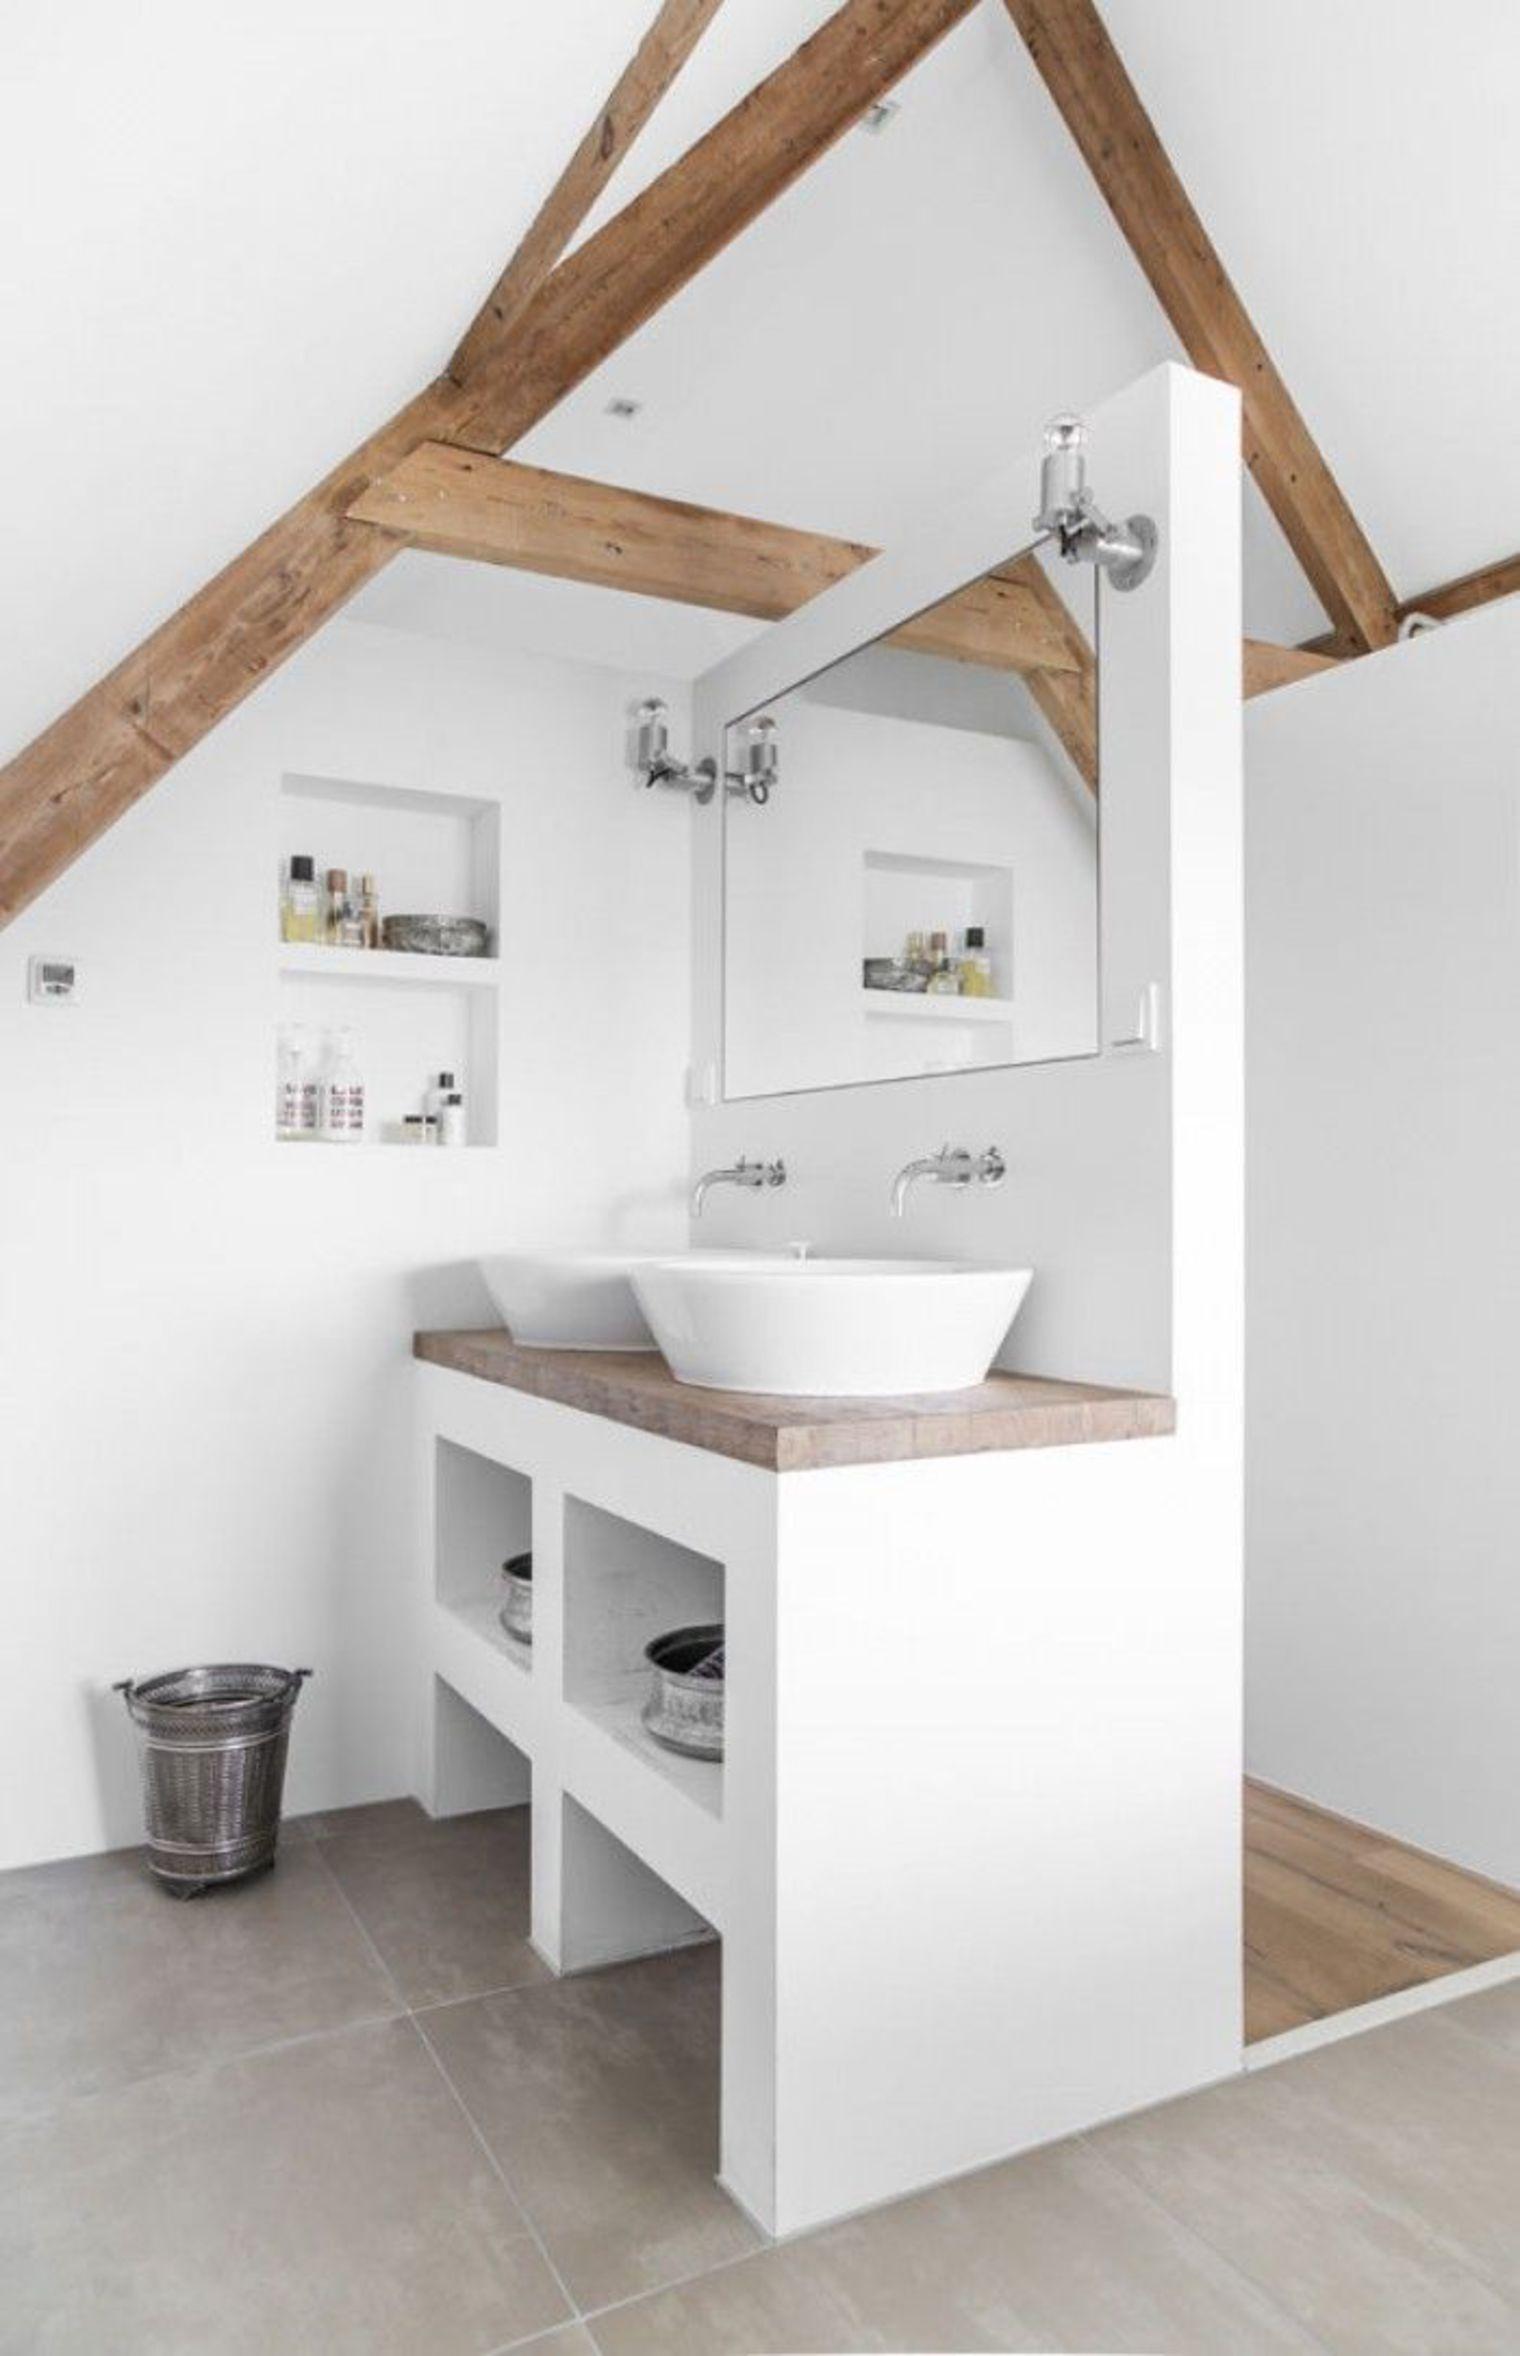 30 fuß vor hause design suiteoftheweek  mansard bathrooms rustic essence in spaces for